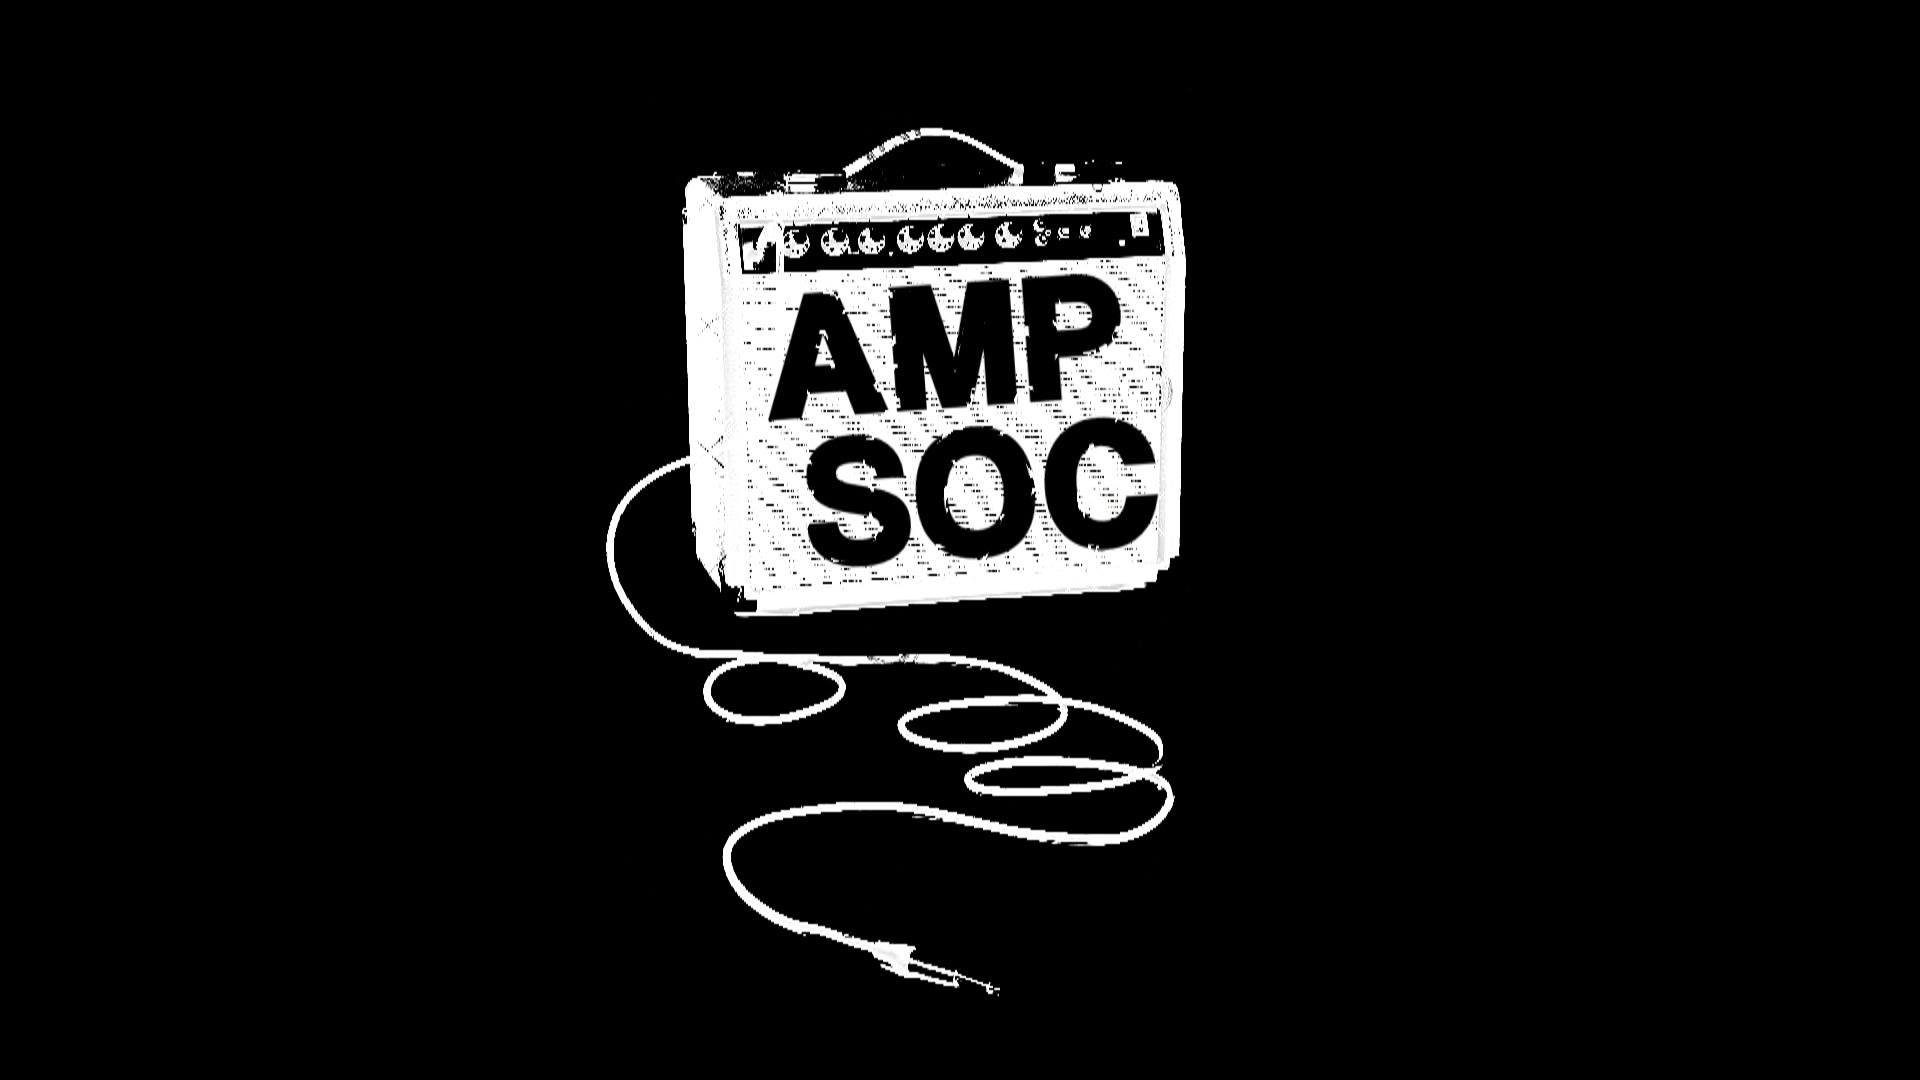 Audio and Music Production Society (AMPSoc) thumbnail